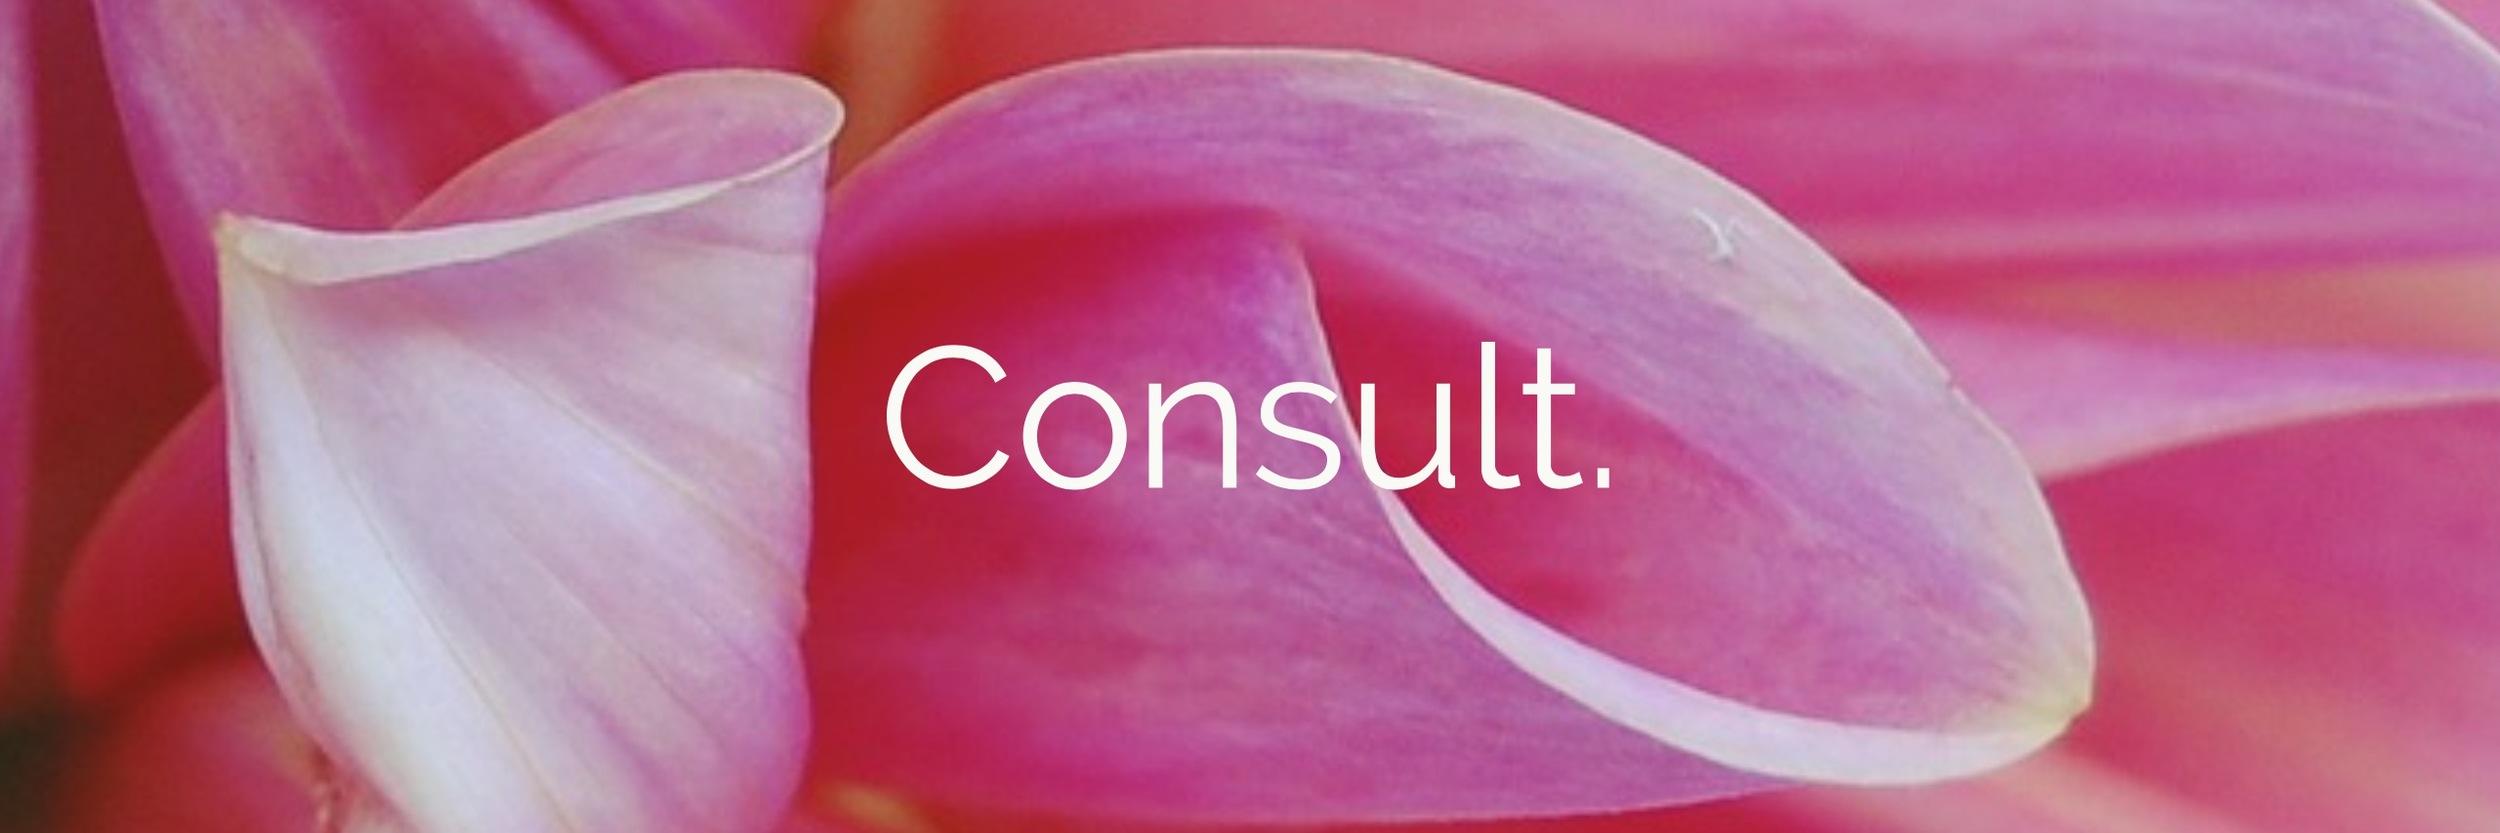 Consult.jpg